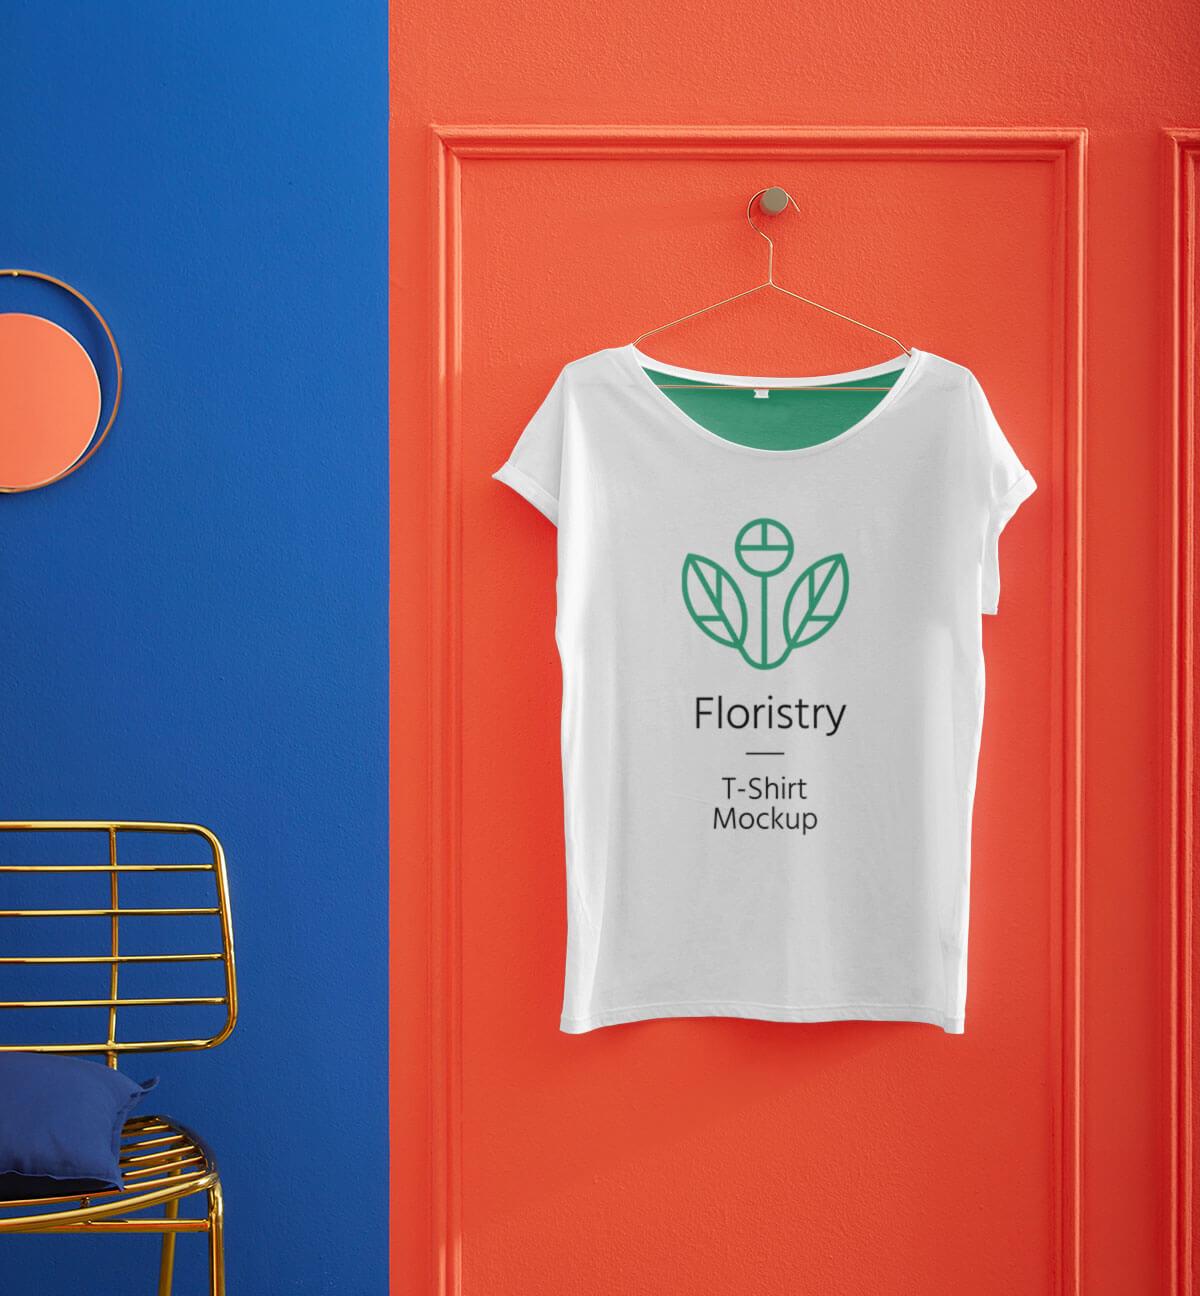 Free-Hanging-T-Shirt-Mockup_PSD-File